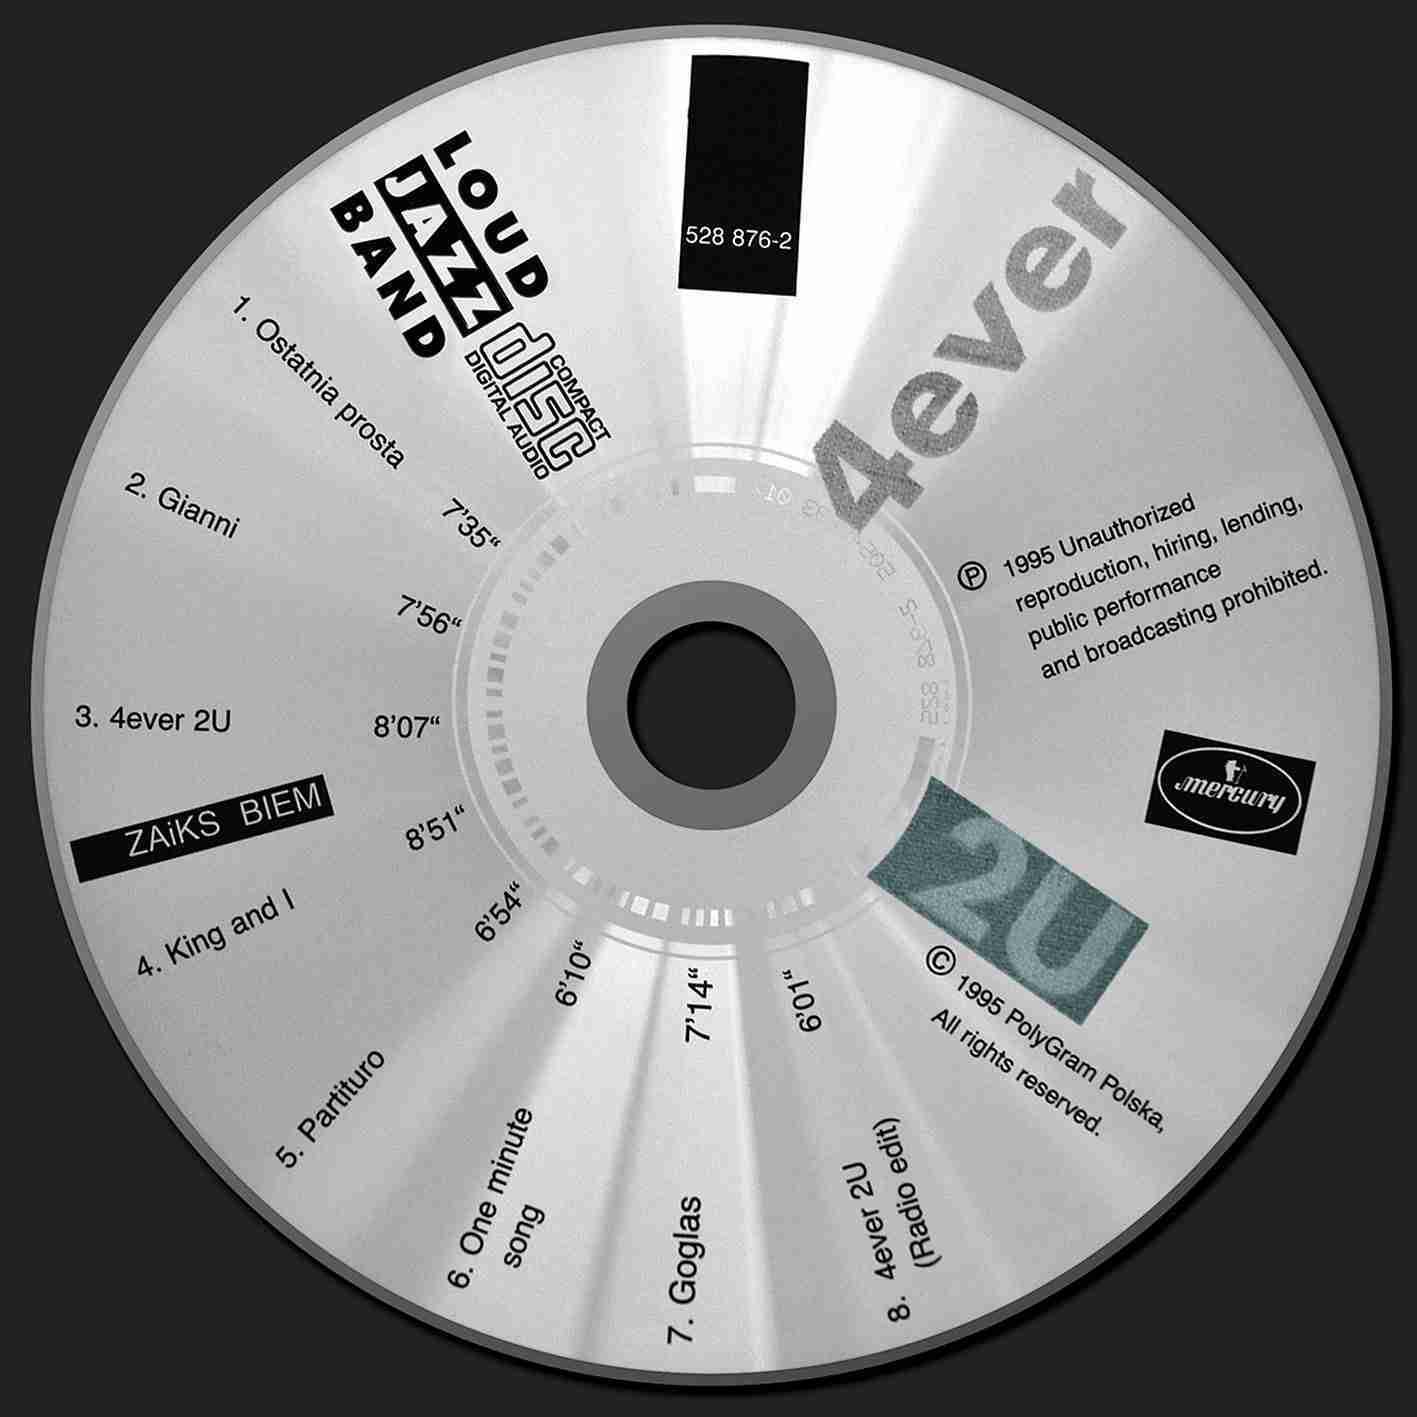 4ever2u - disc project